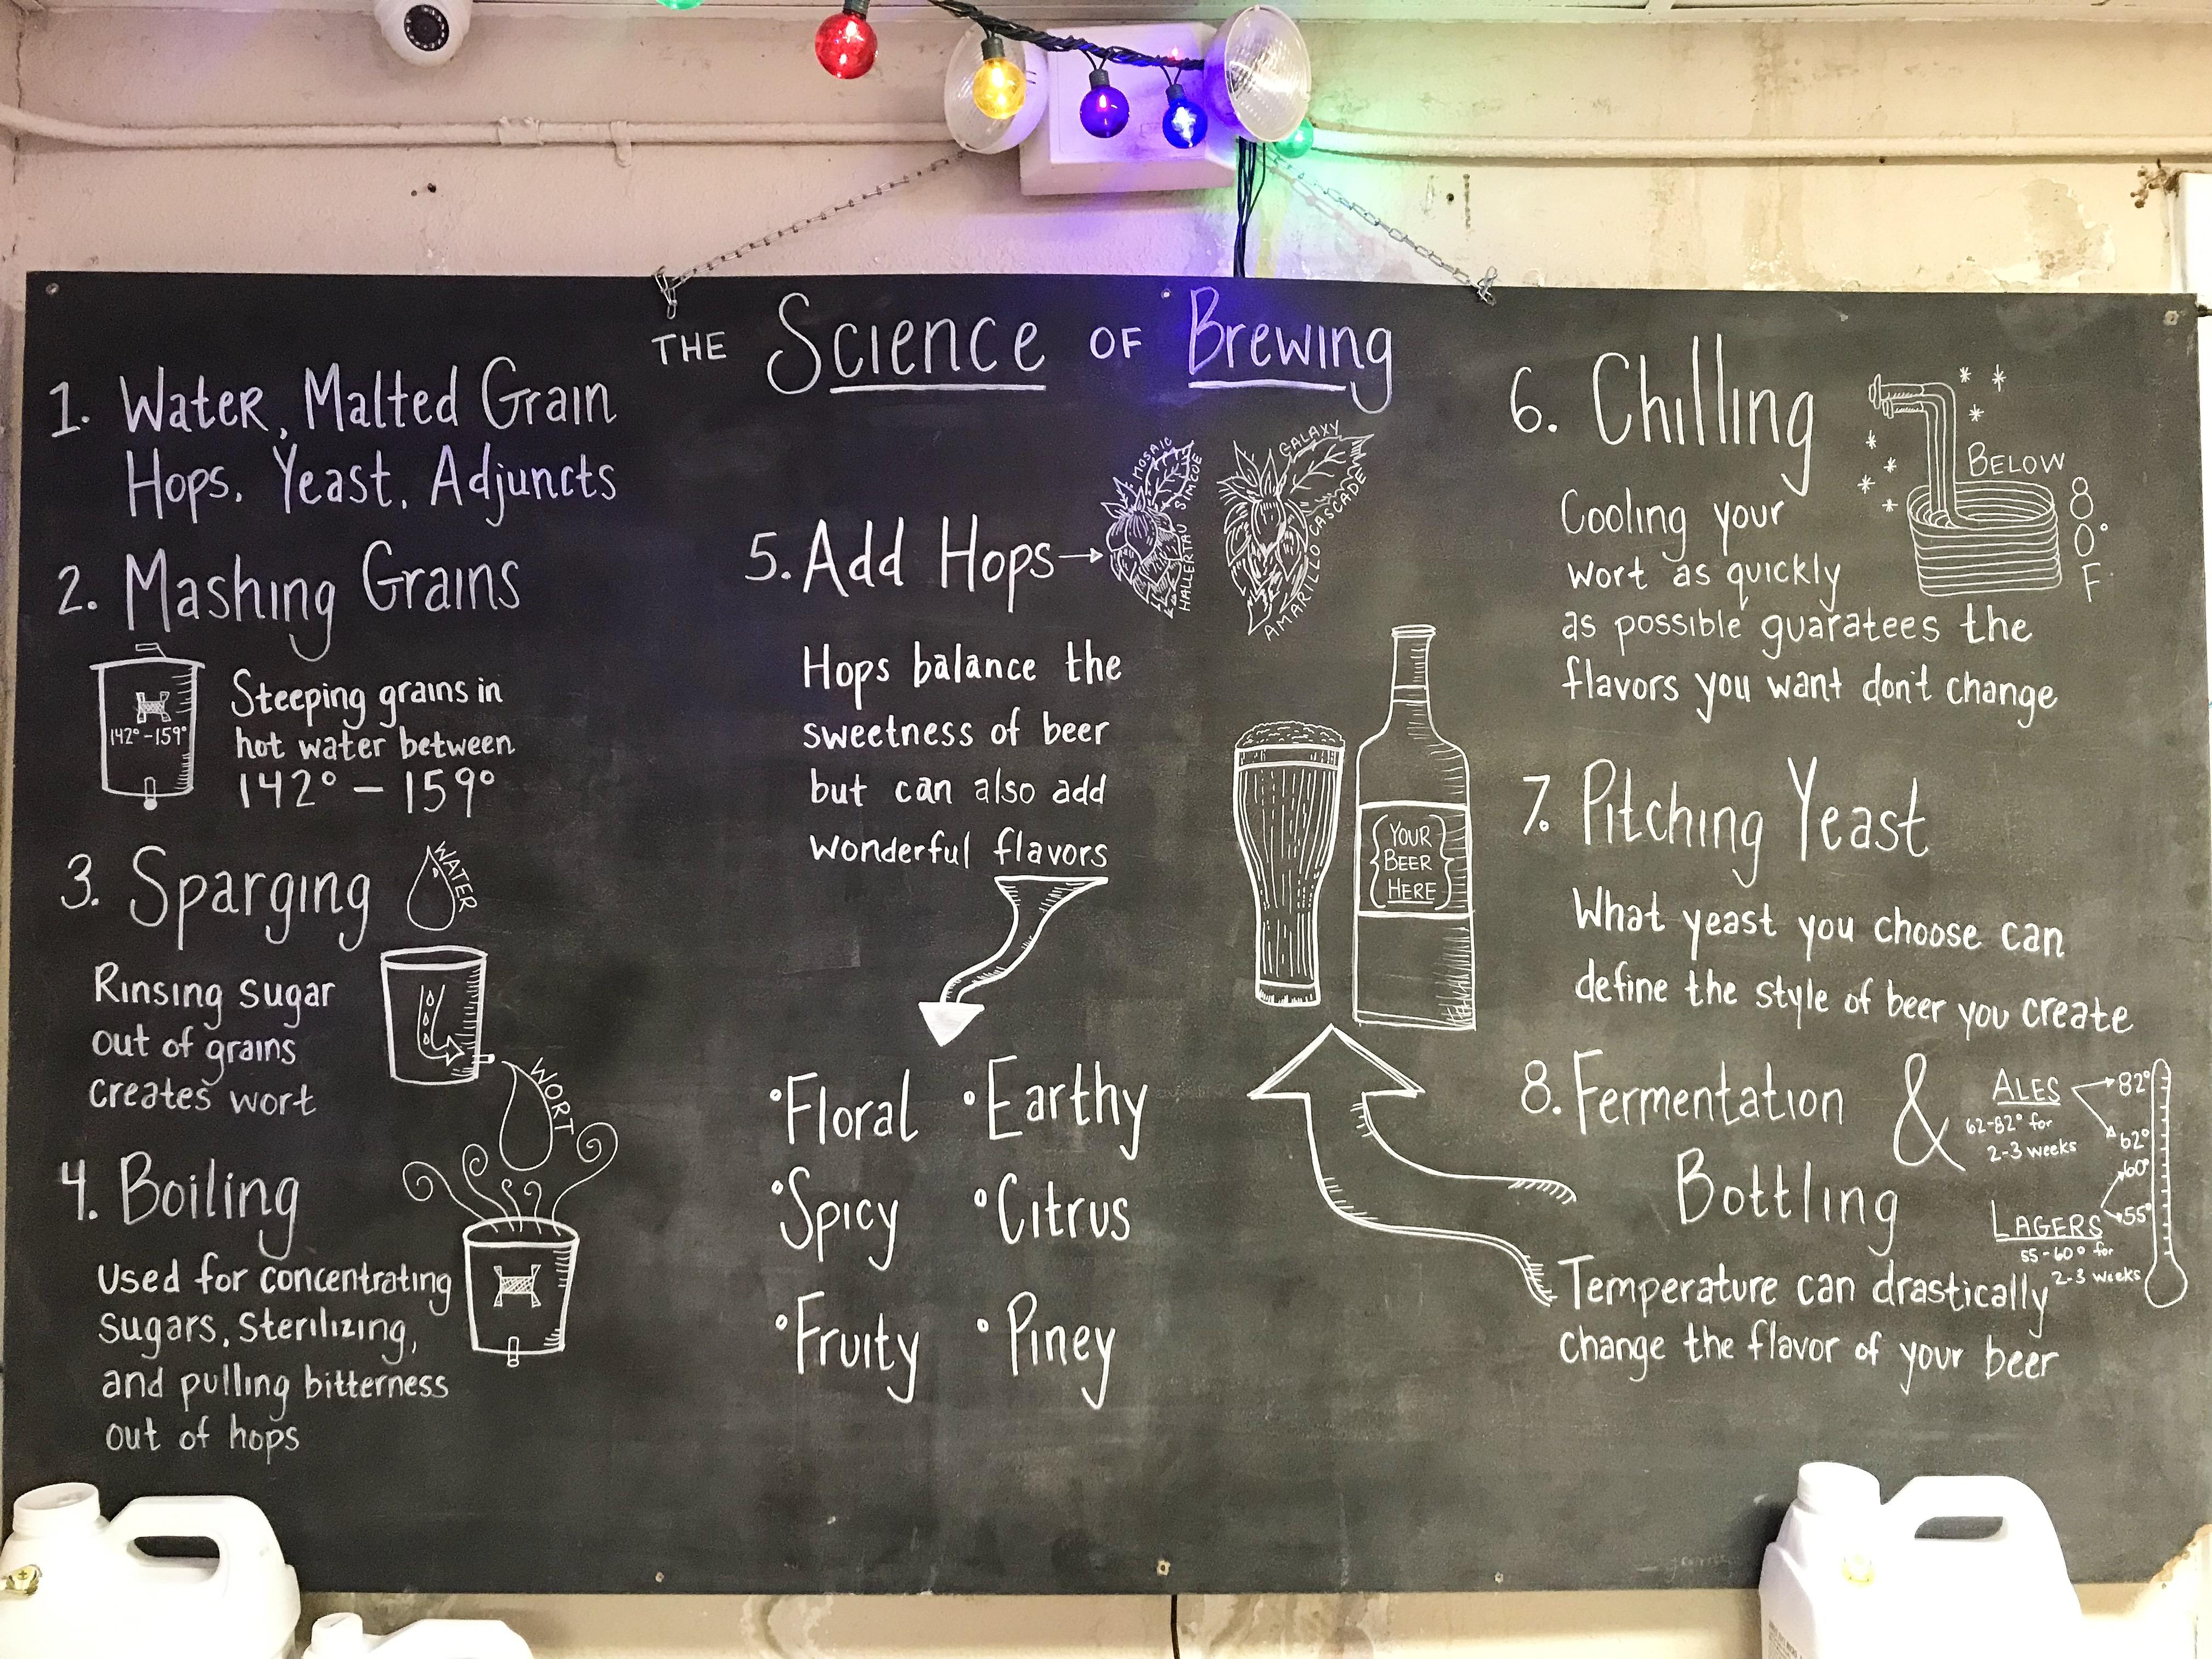 Brewing process